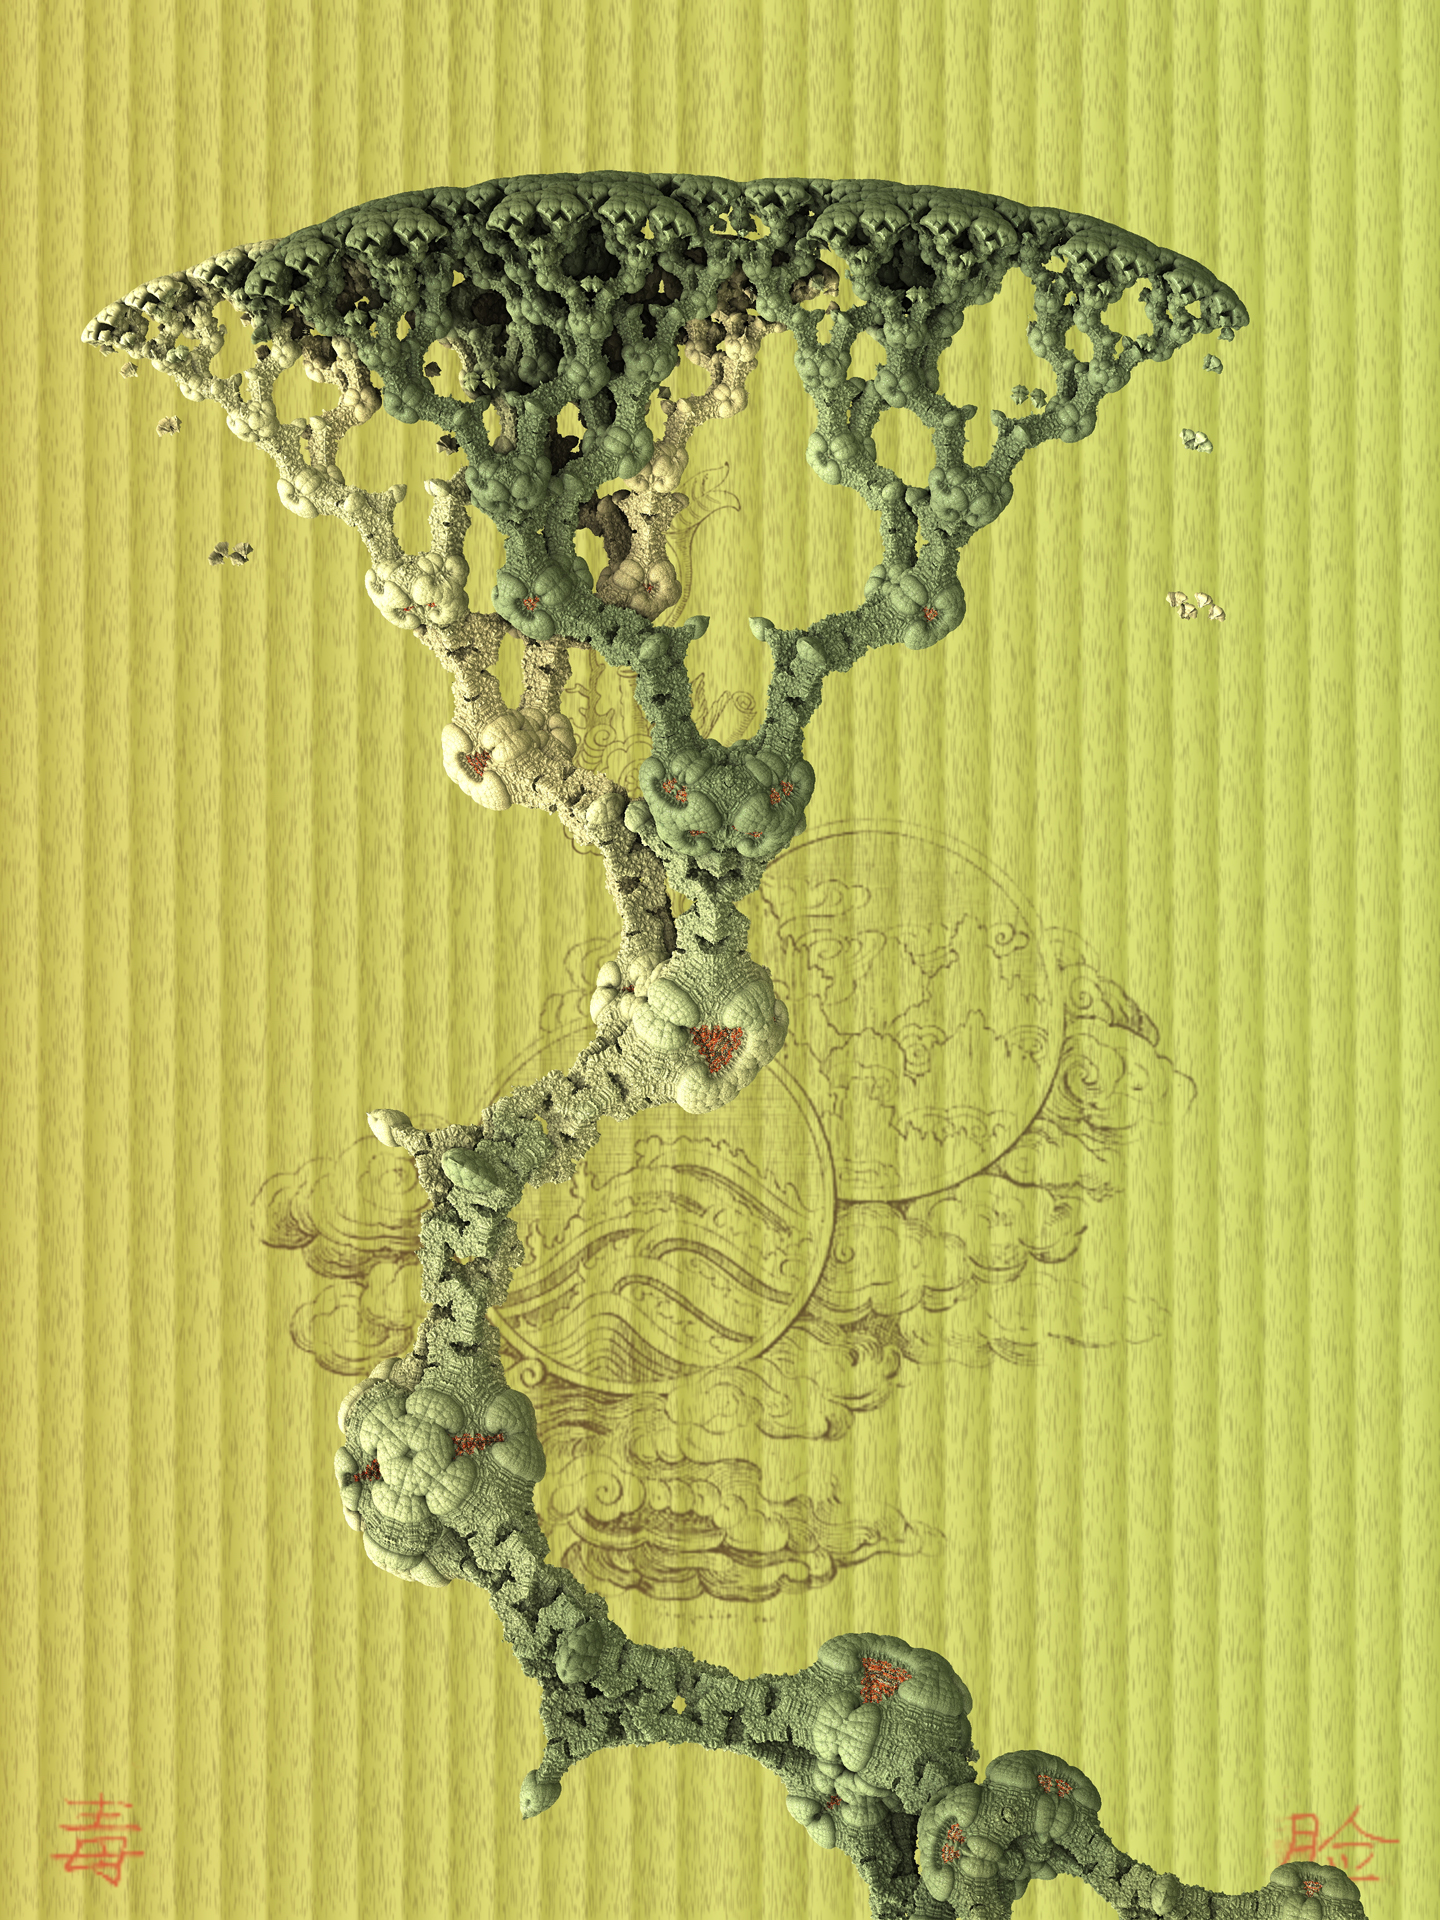 Bonsai by viperv6